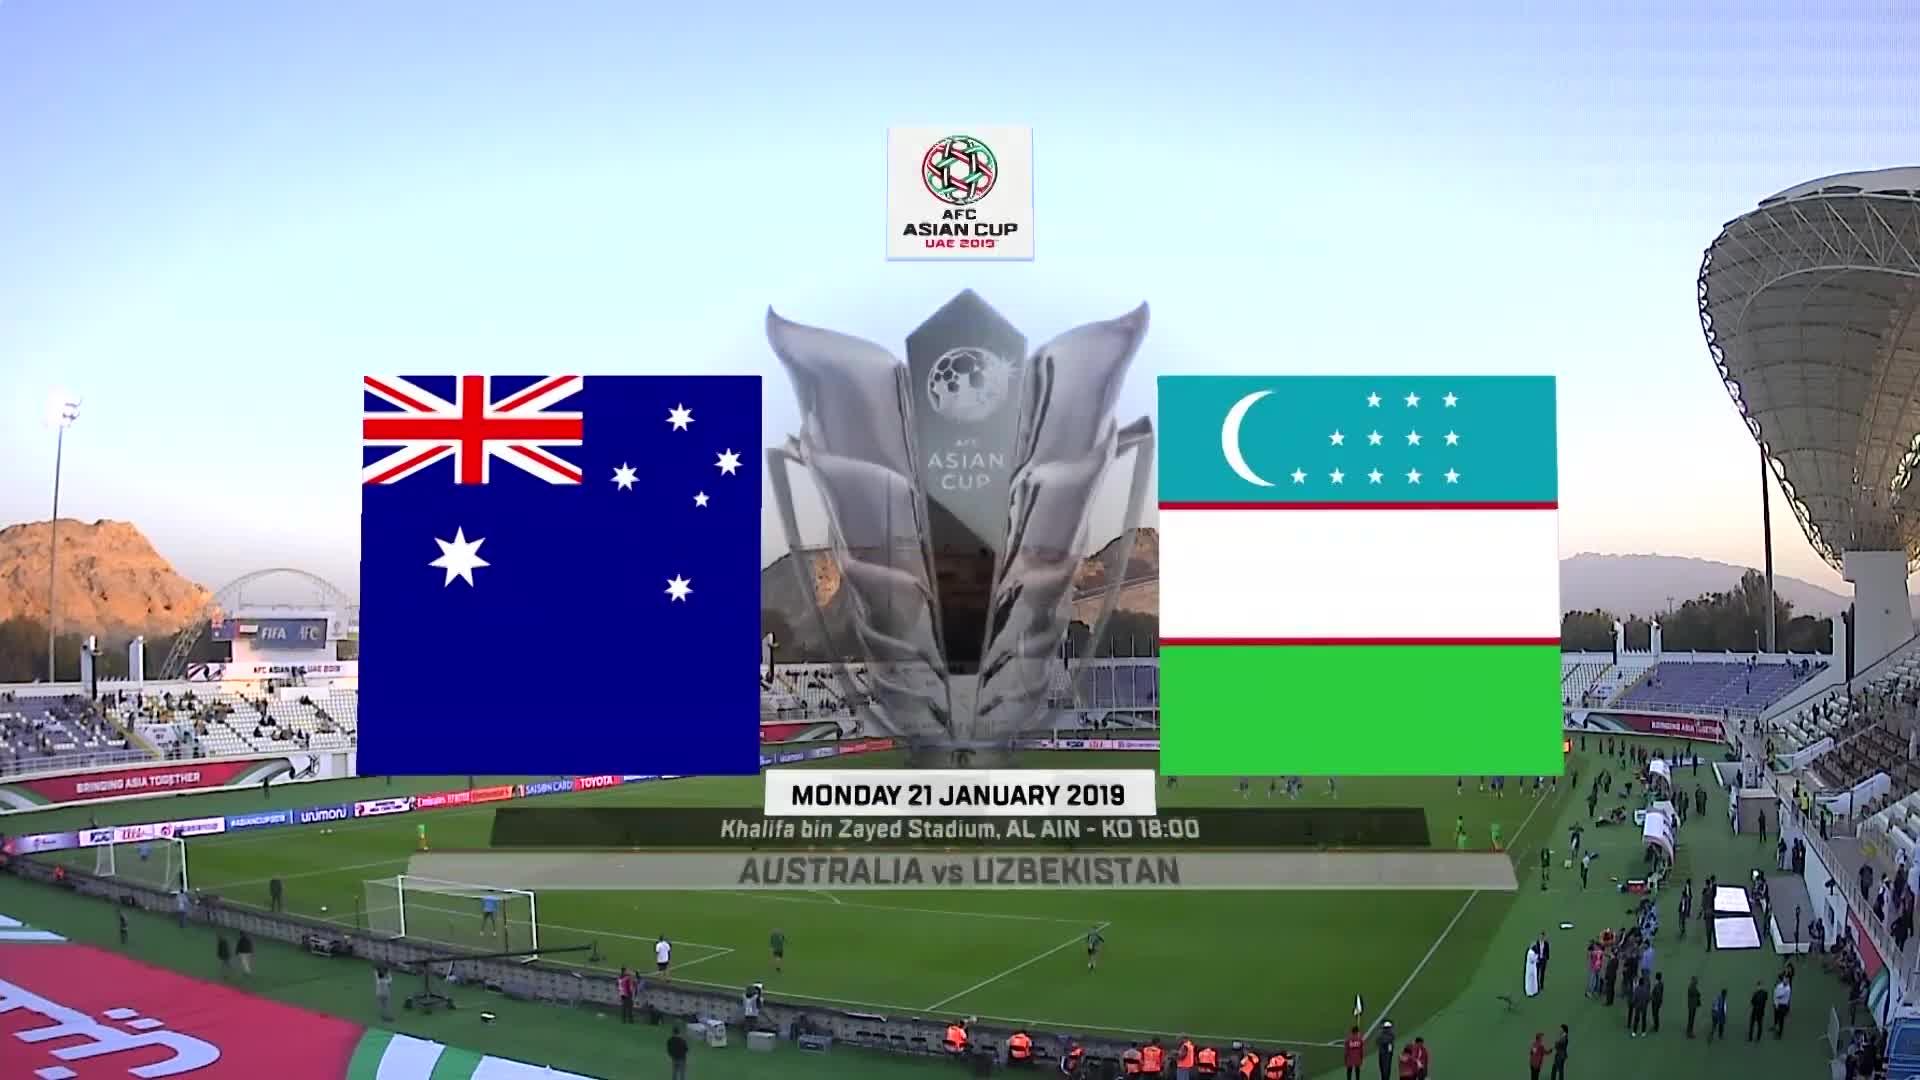 Vòng 1/8 Asian Cup 2019: Australia 0-0 Uzbekistan (luân lưu 4-2) (nguồn: AFC)